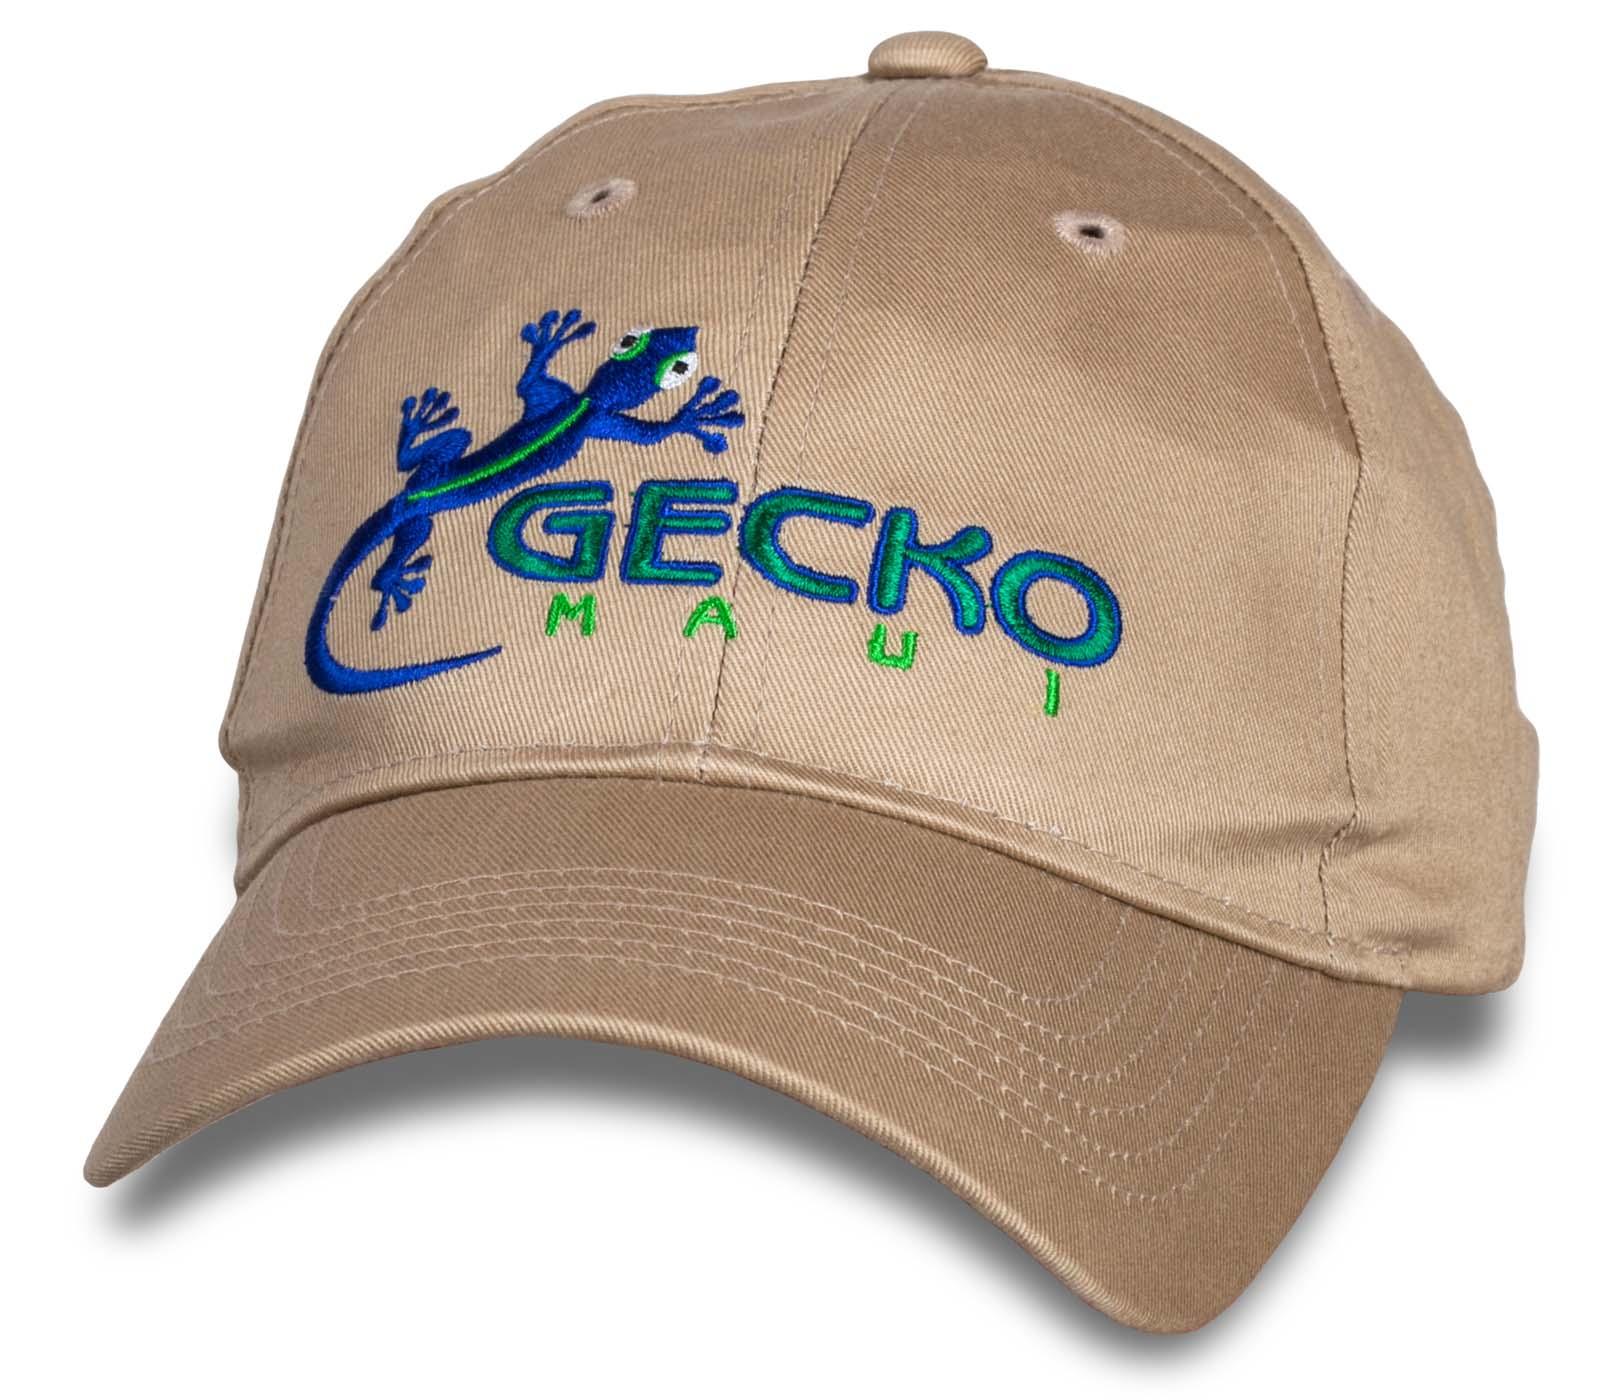 Летняя кепка-бейсболка Gecko Maui.